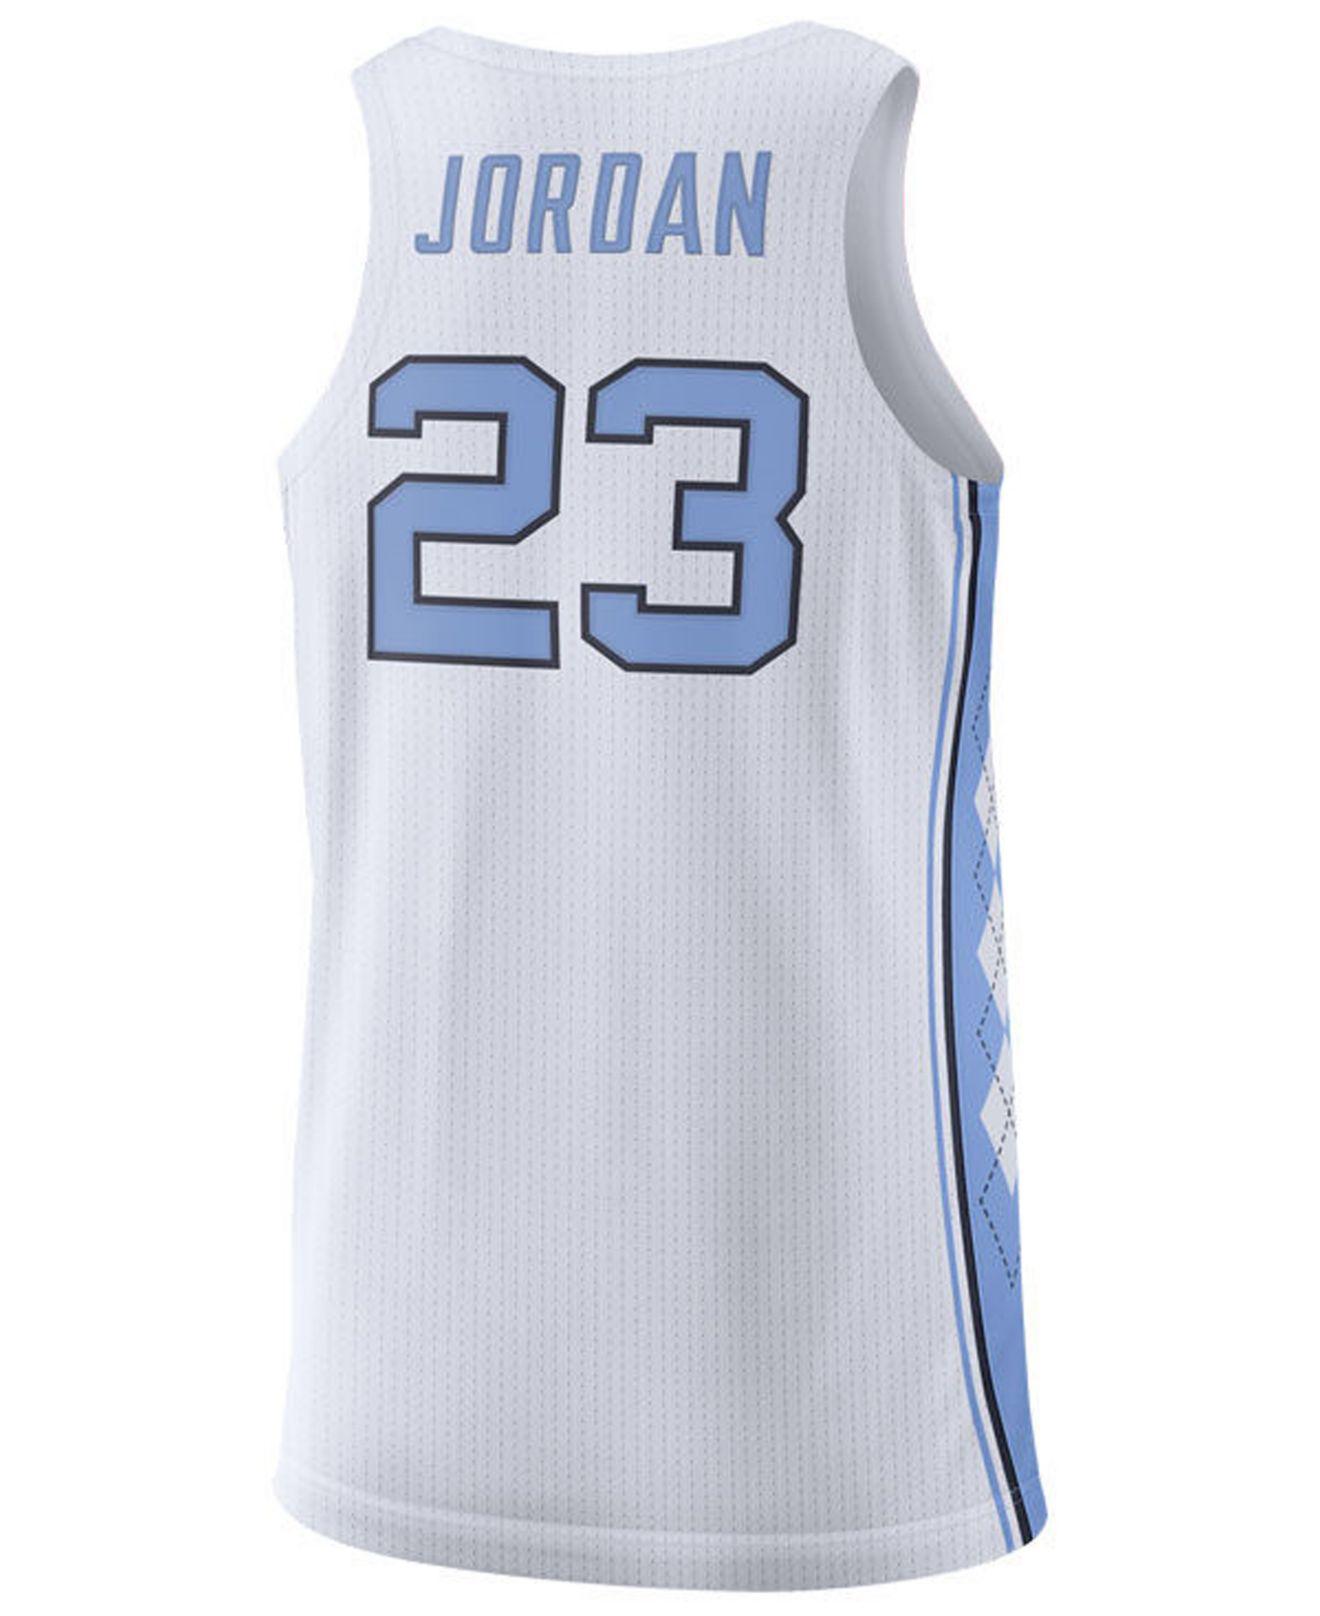 6c23f566b60 Nike Michael Jordan North Carolina Tar Heels Authentic Basketball Jersey in  White for Men - Lyst